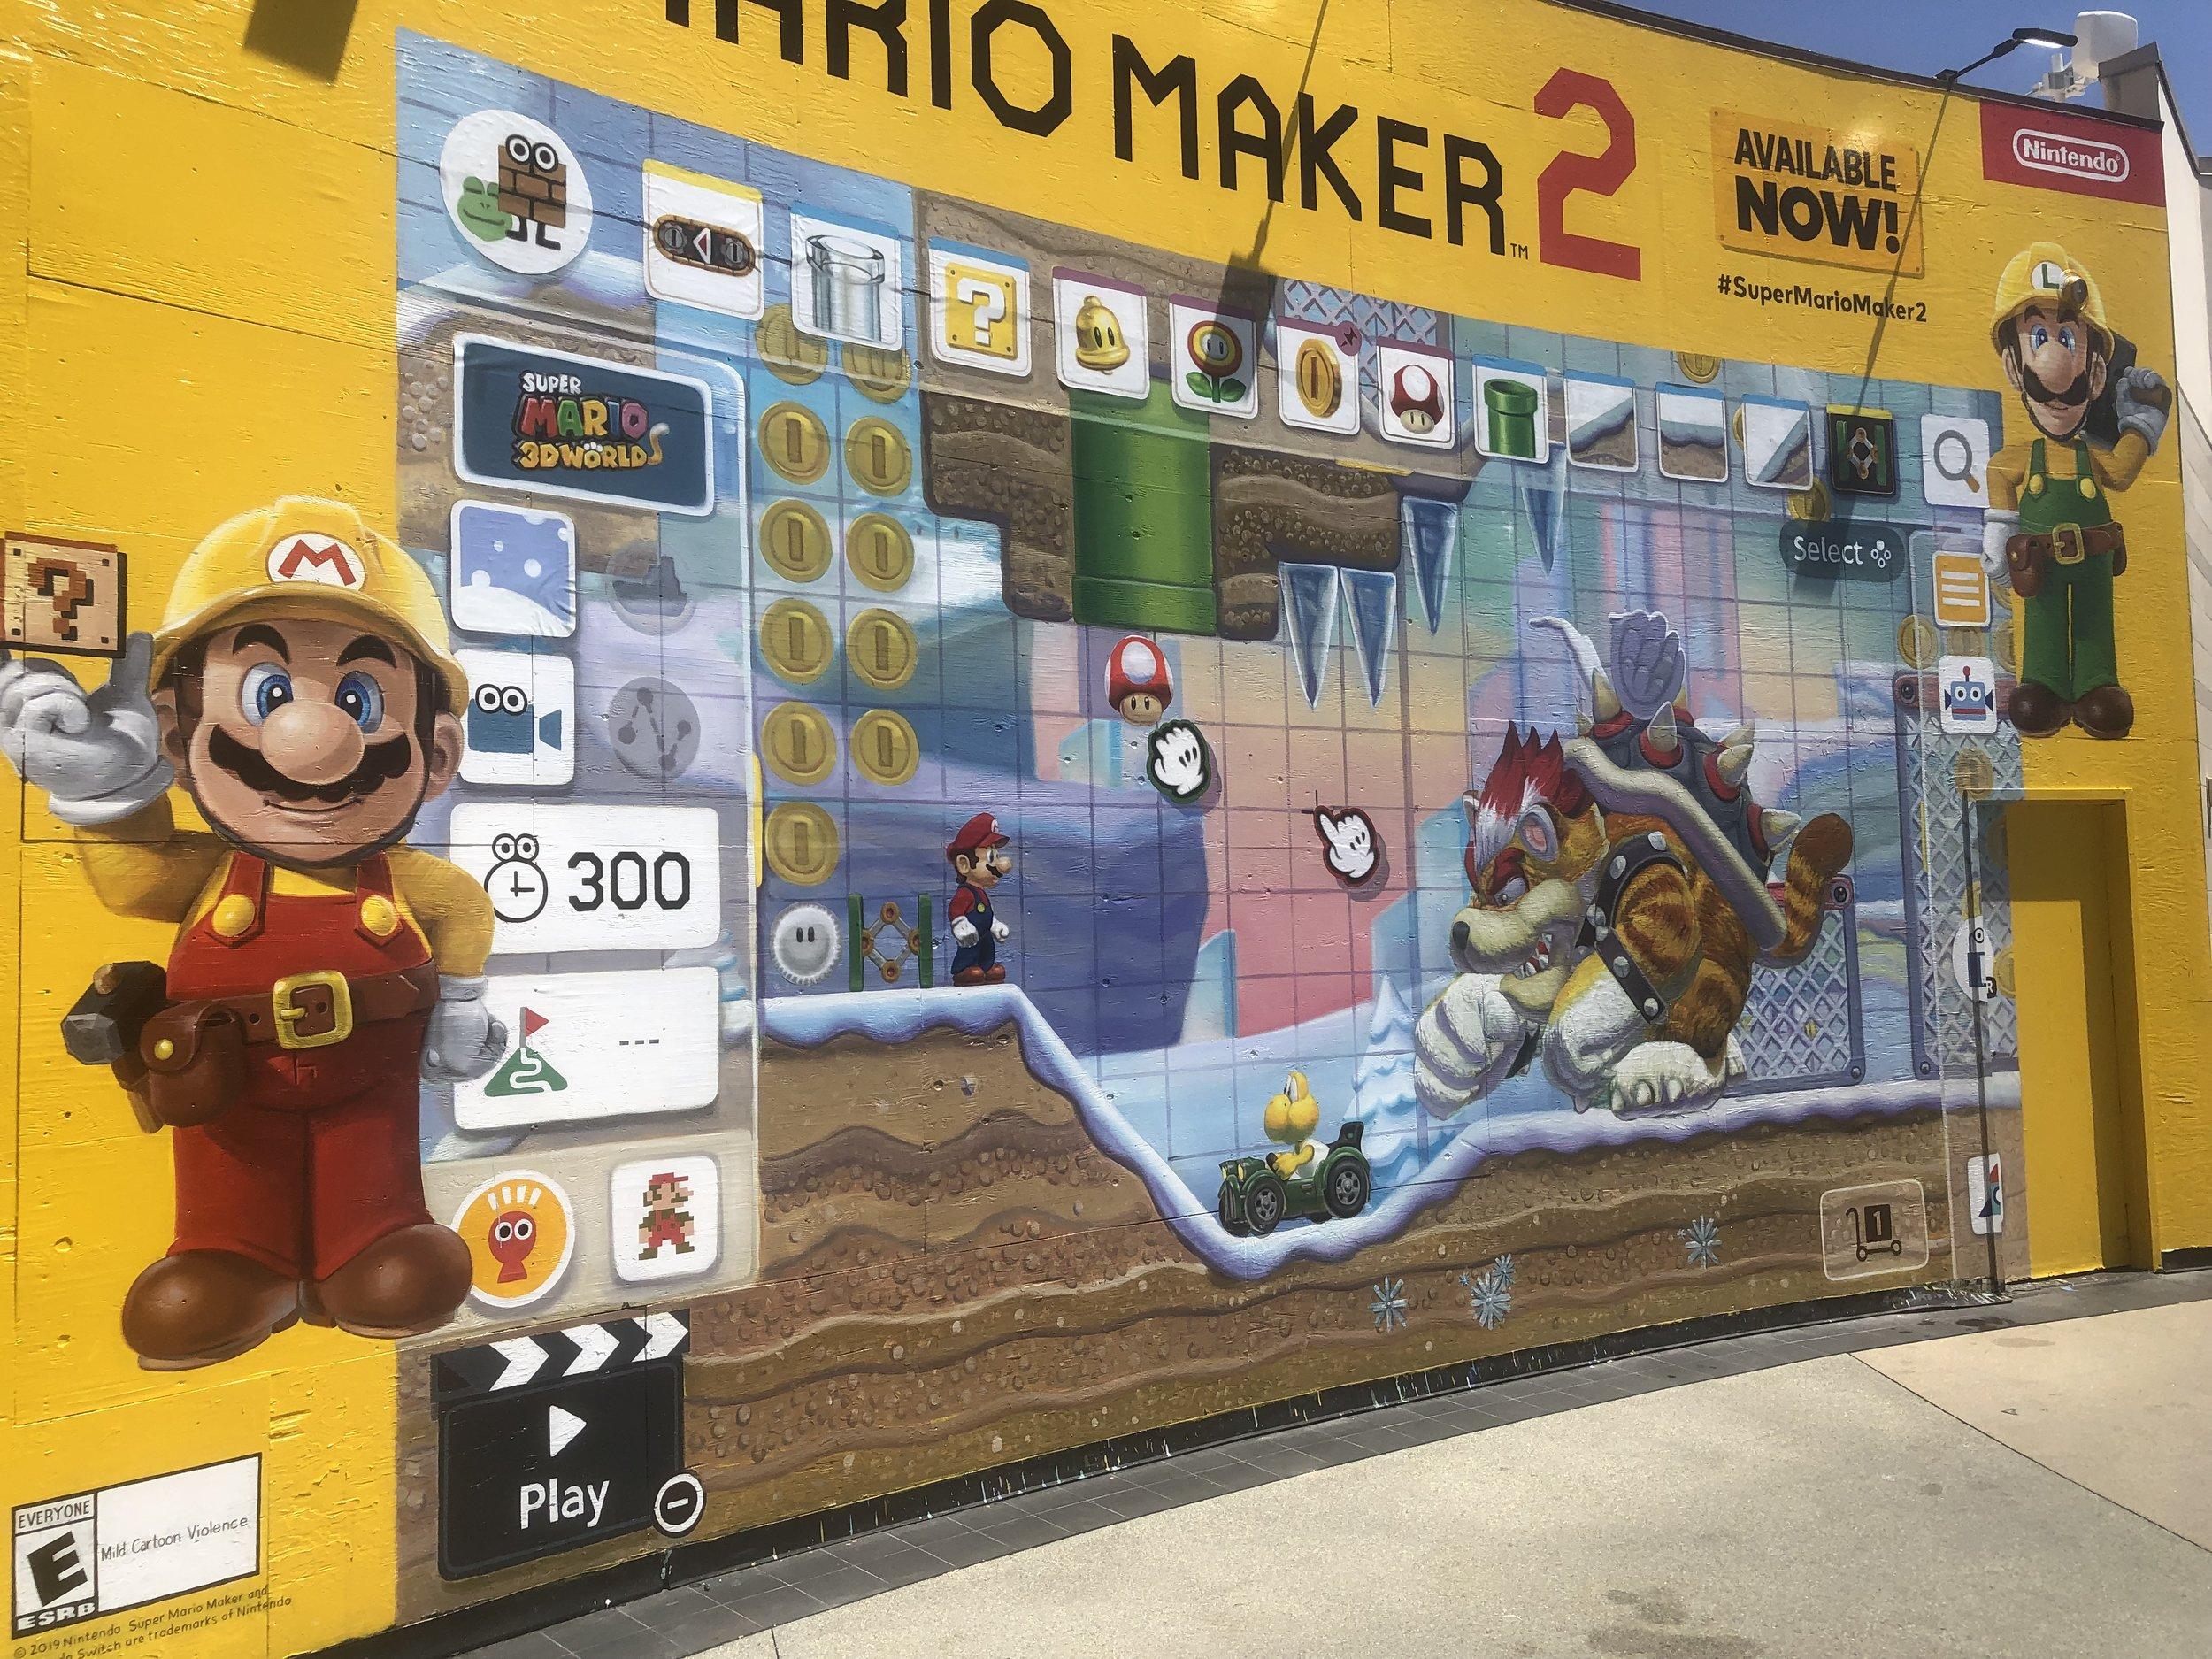 Super Mario Maker 2 - Week 4 @ Santa Monica Place Mall